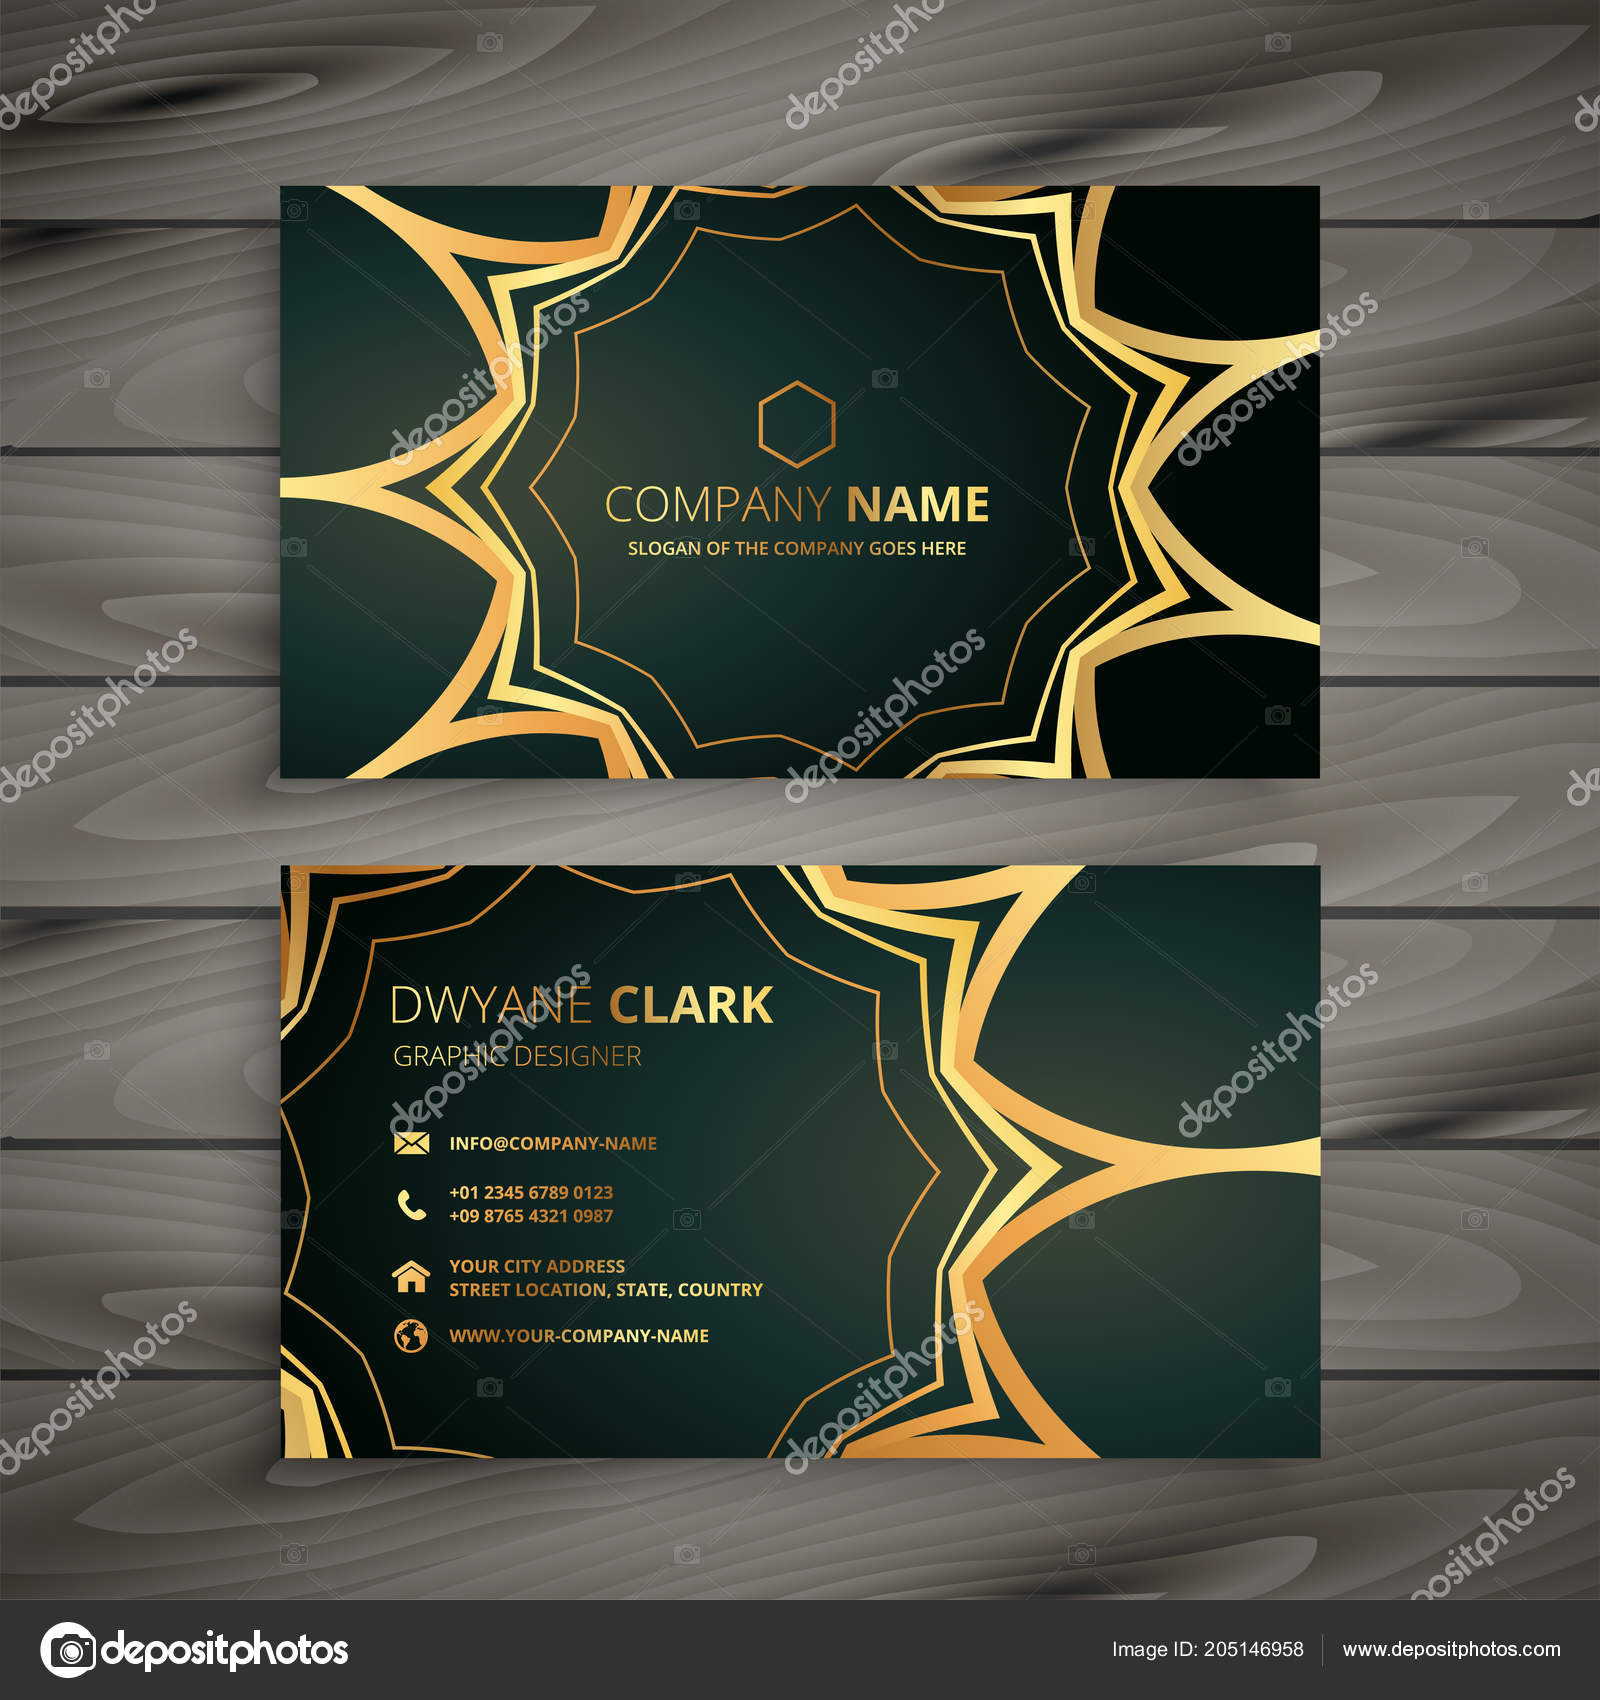 Stylish luxury business card design vetor de stock starline stylish luxury business card design vetor de stock reheart Image collections